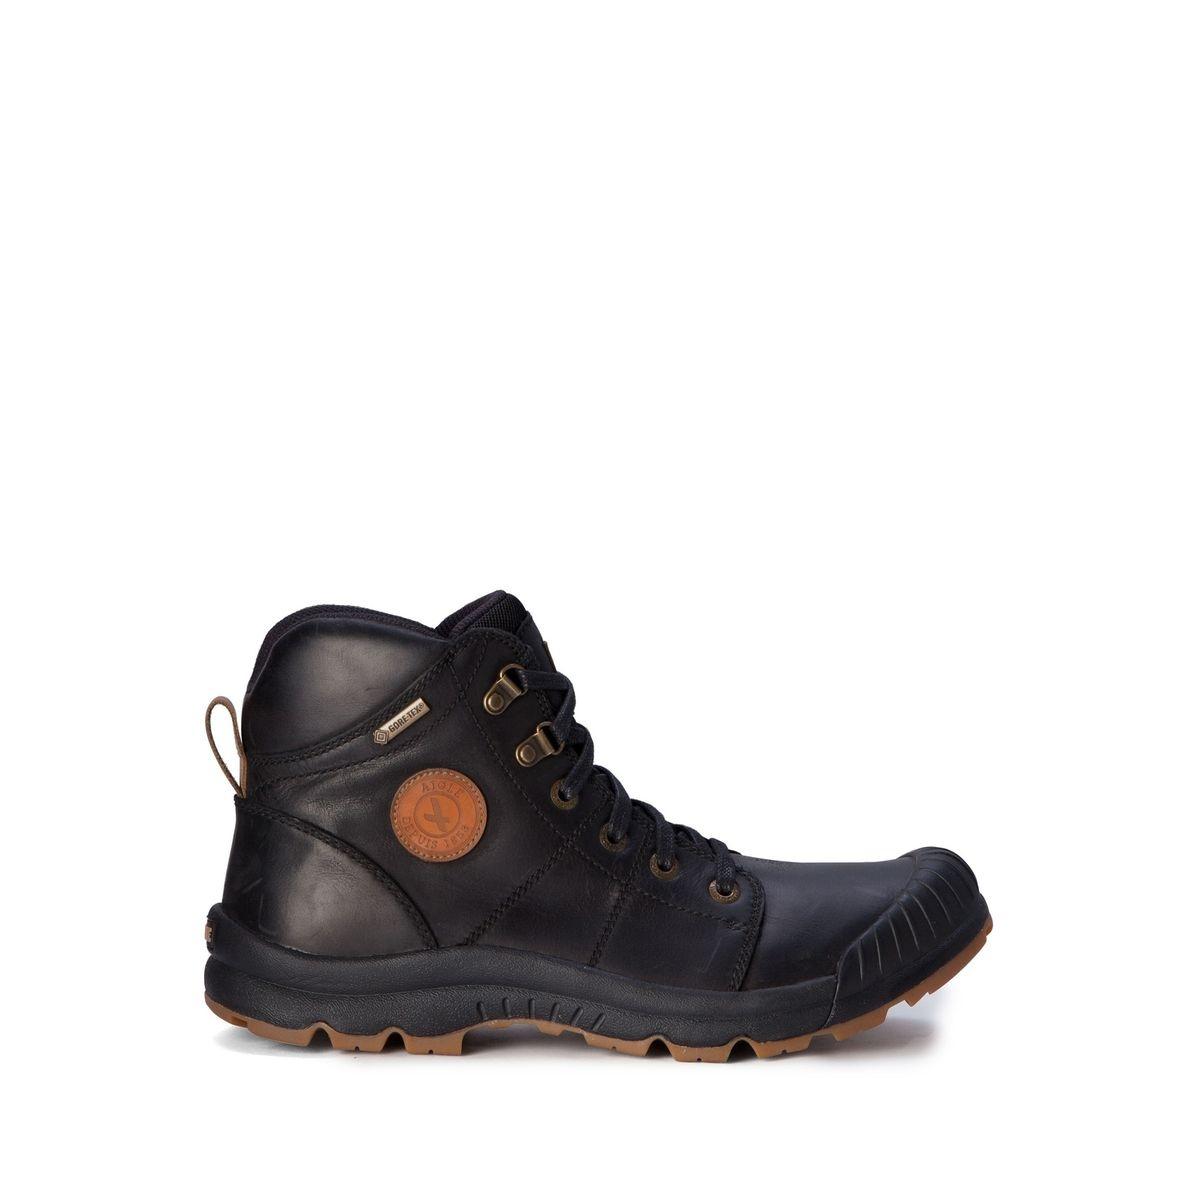 Chaussures de marche Gore-Tex® Tenere Light Leather Gore-Tex